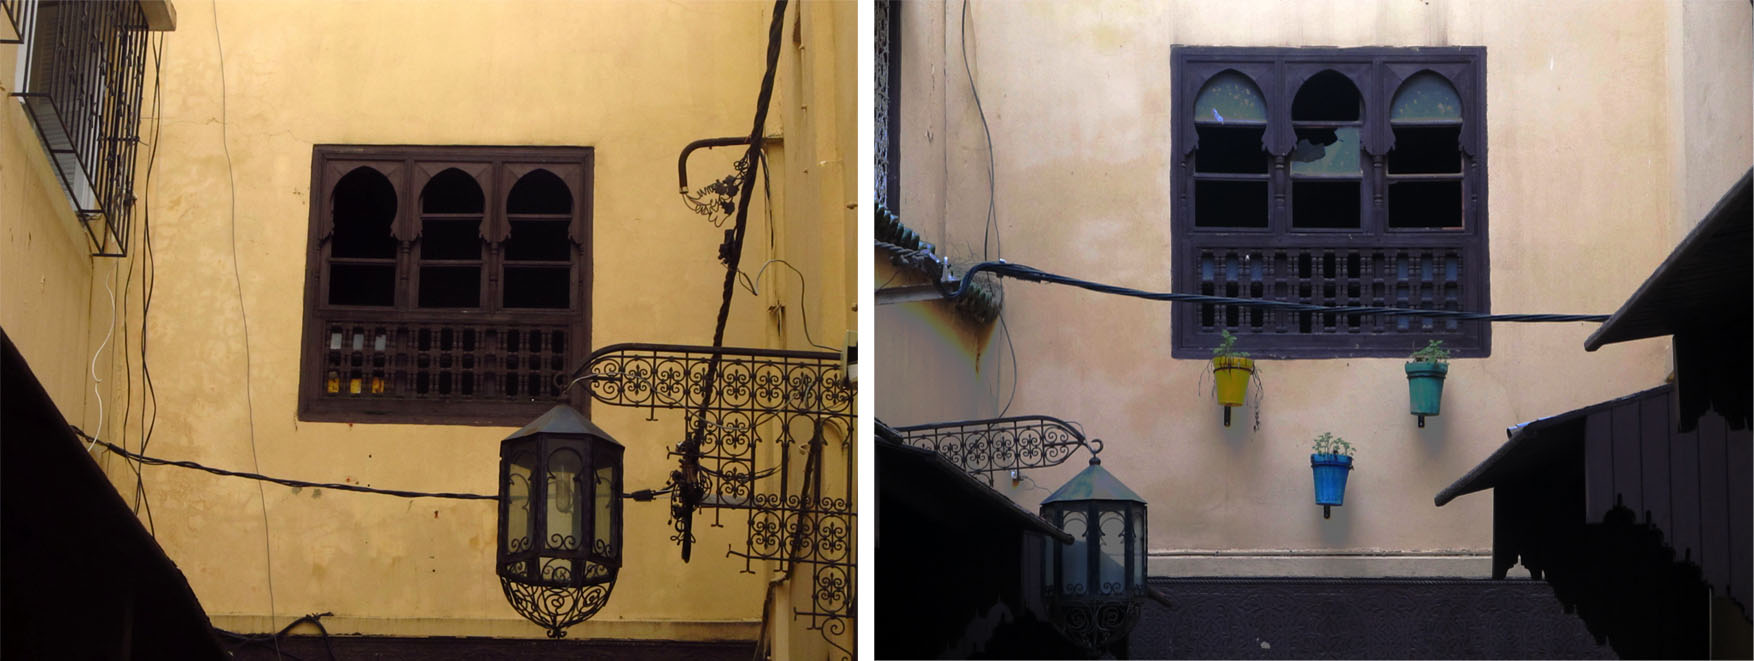 06 meknes medina prozori